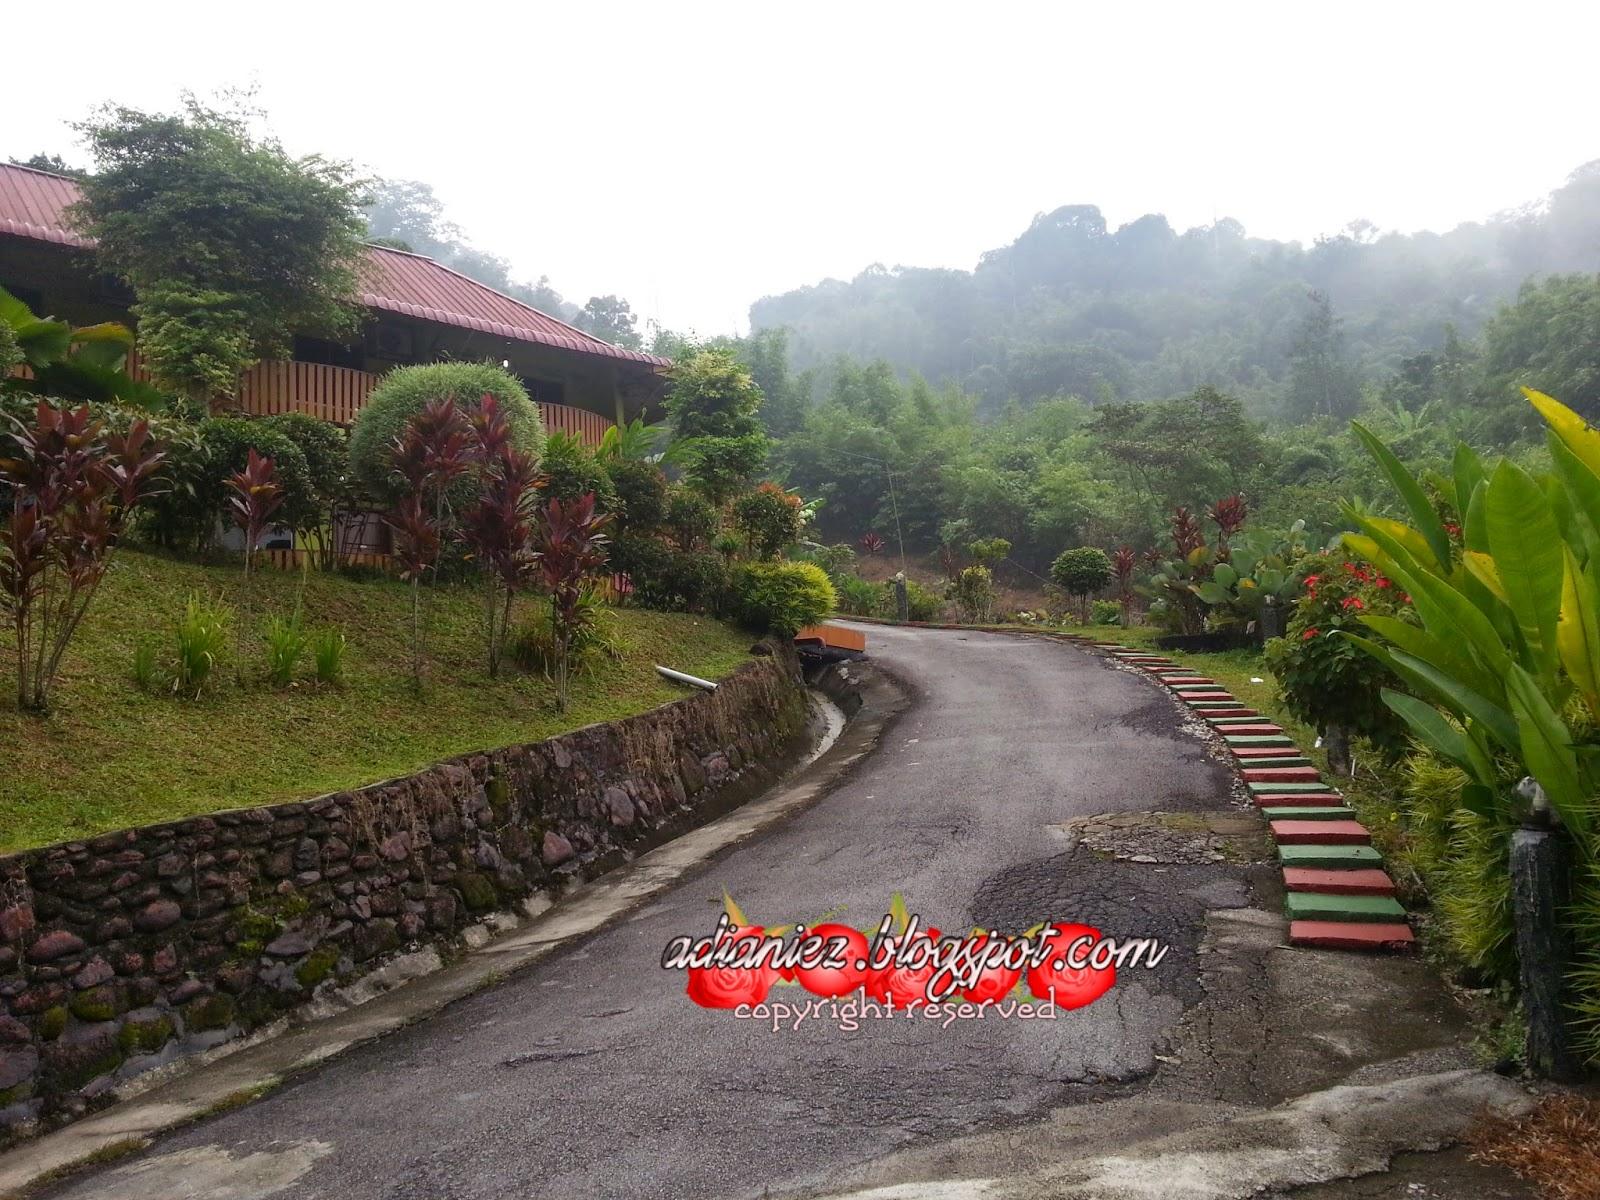 Agrotek Garden Resort, Ulu Langat, Selangor